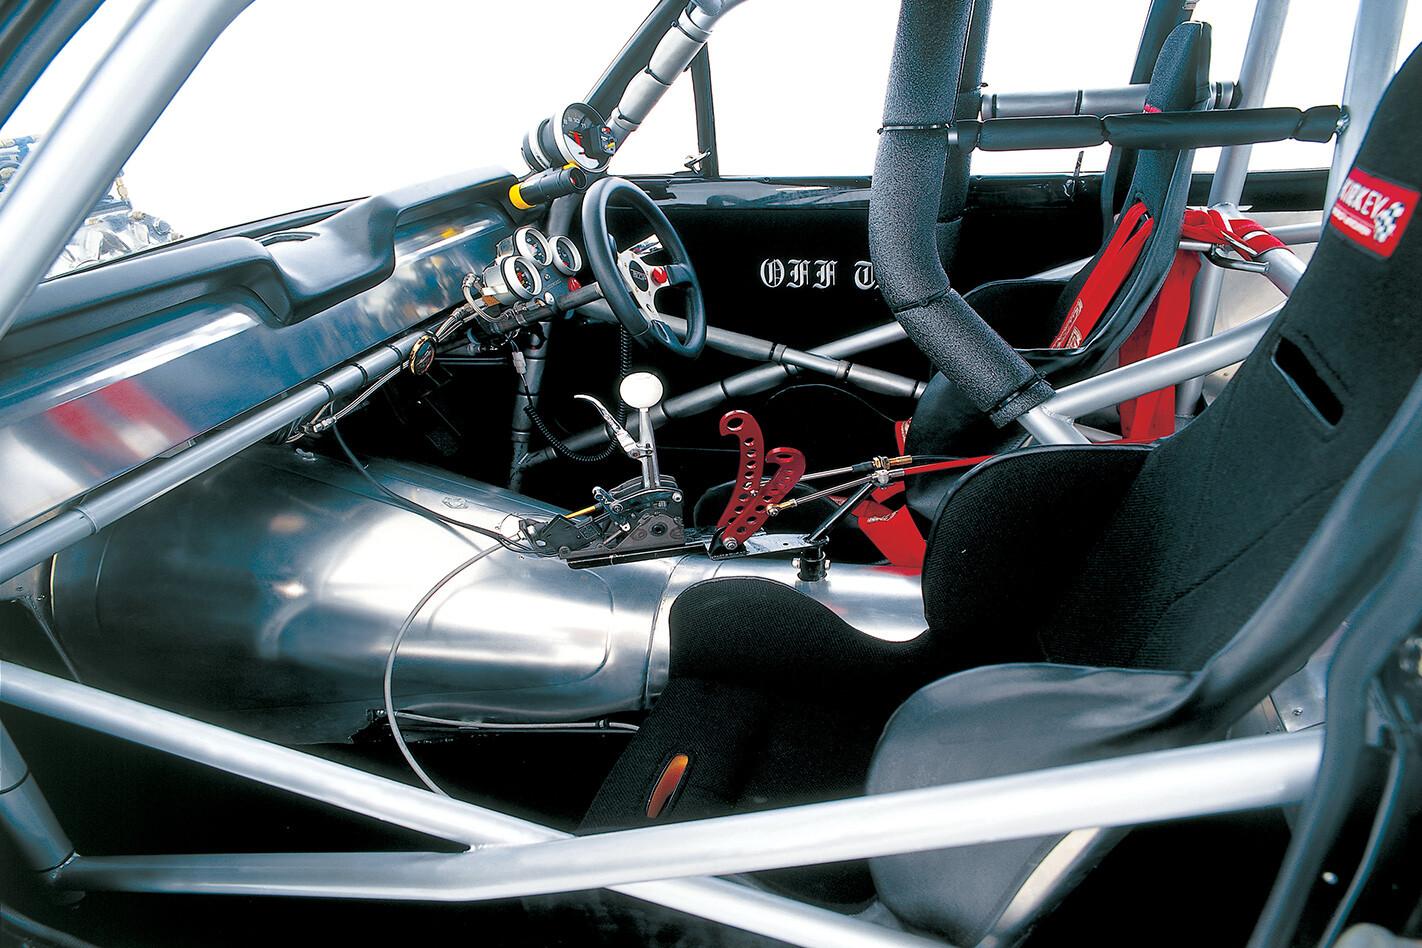 1970 LC Torana Holden INTERIOR